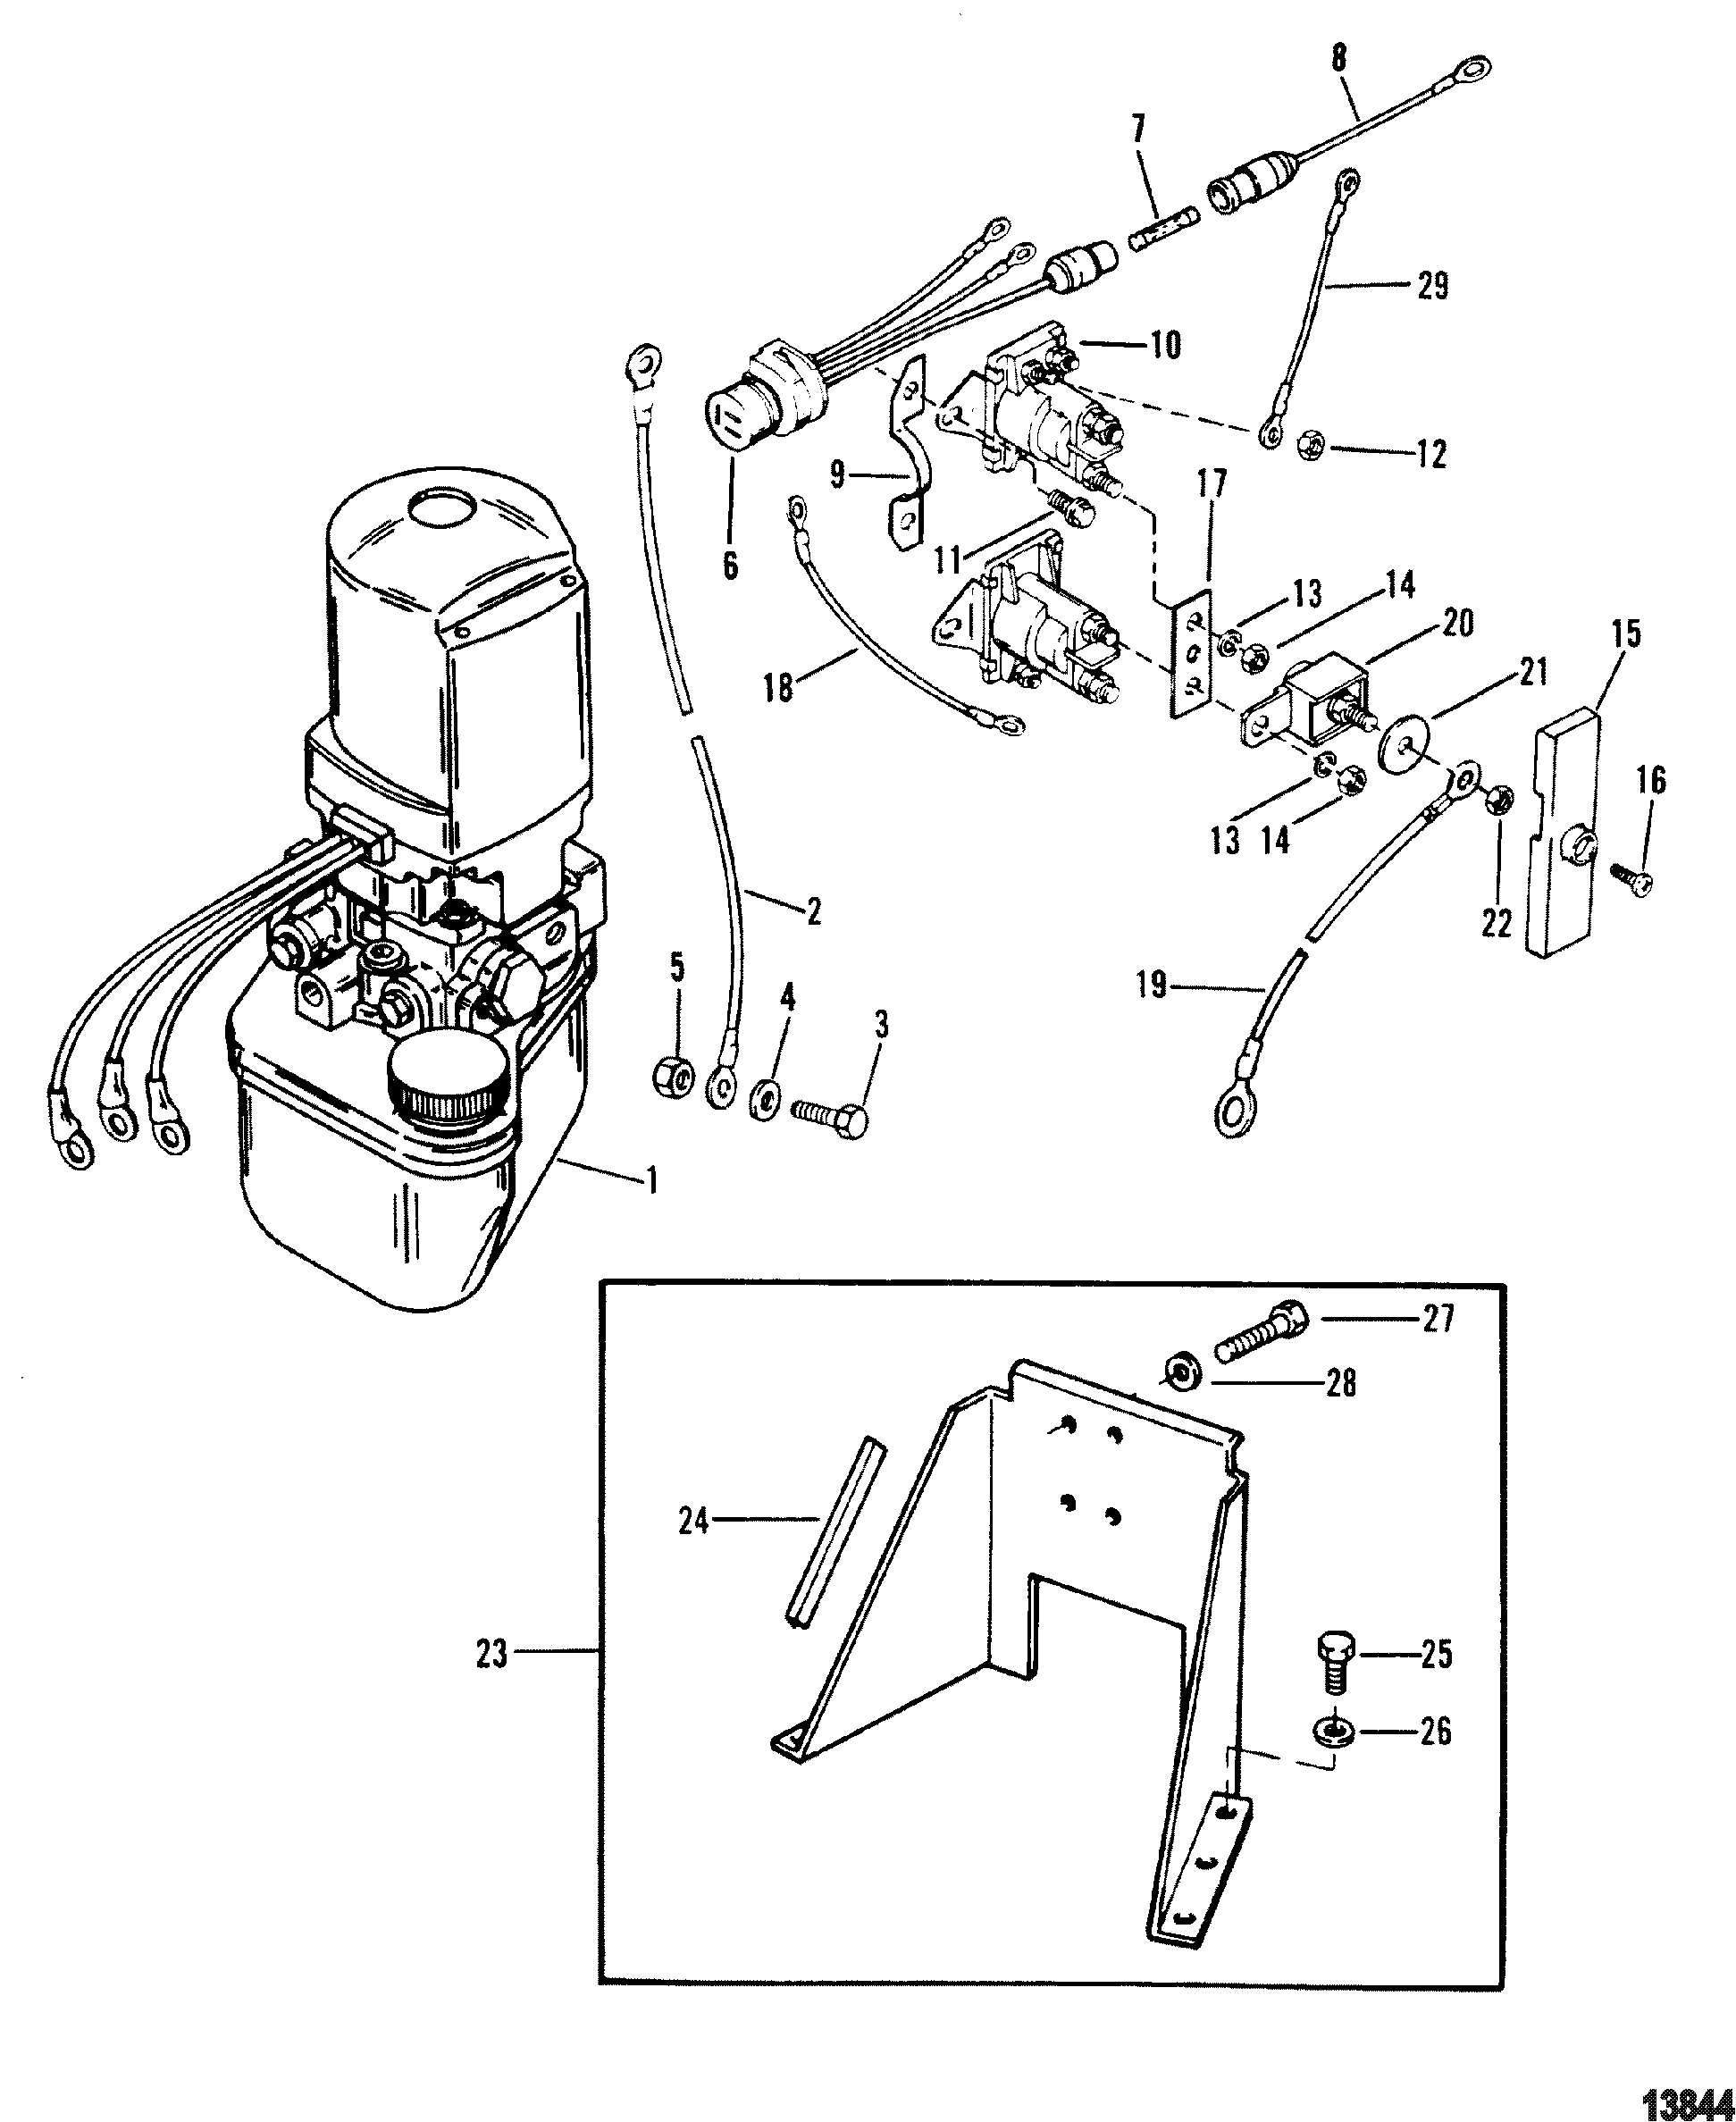 alpha one trim wiring diagram three prong massager hydraulic pump and bracket for mercruiser gen ii